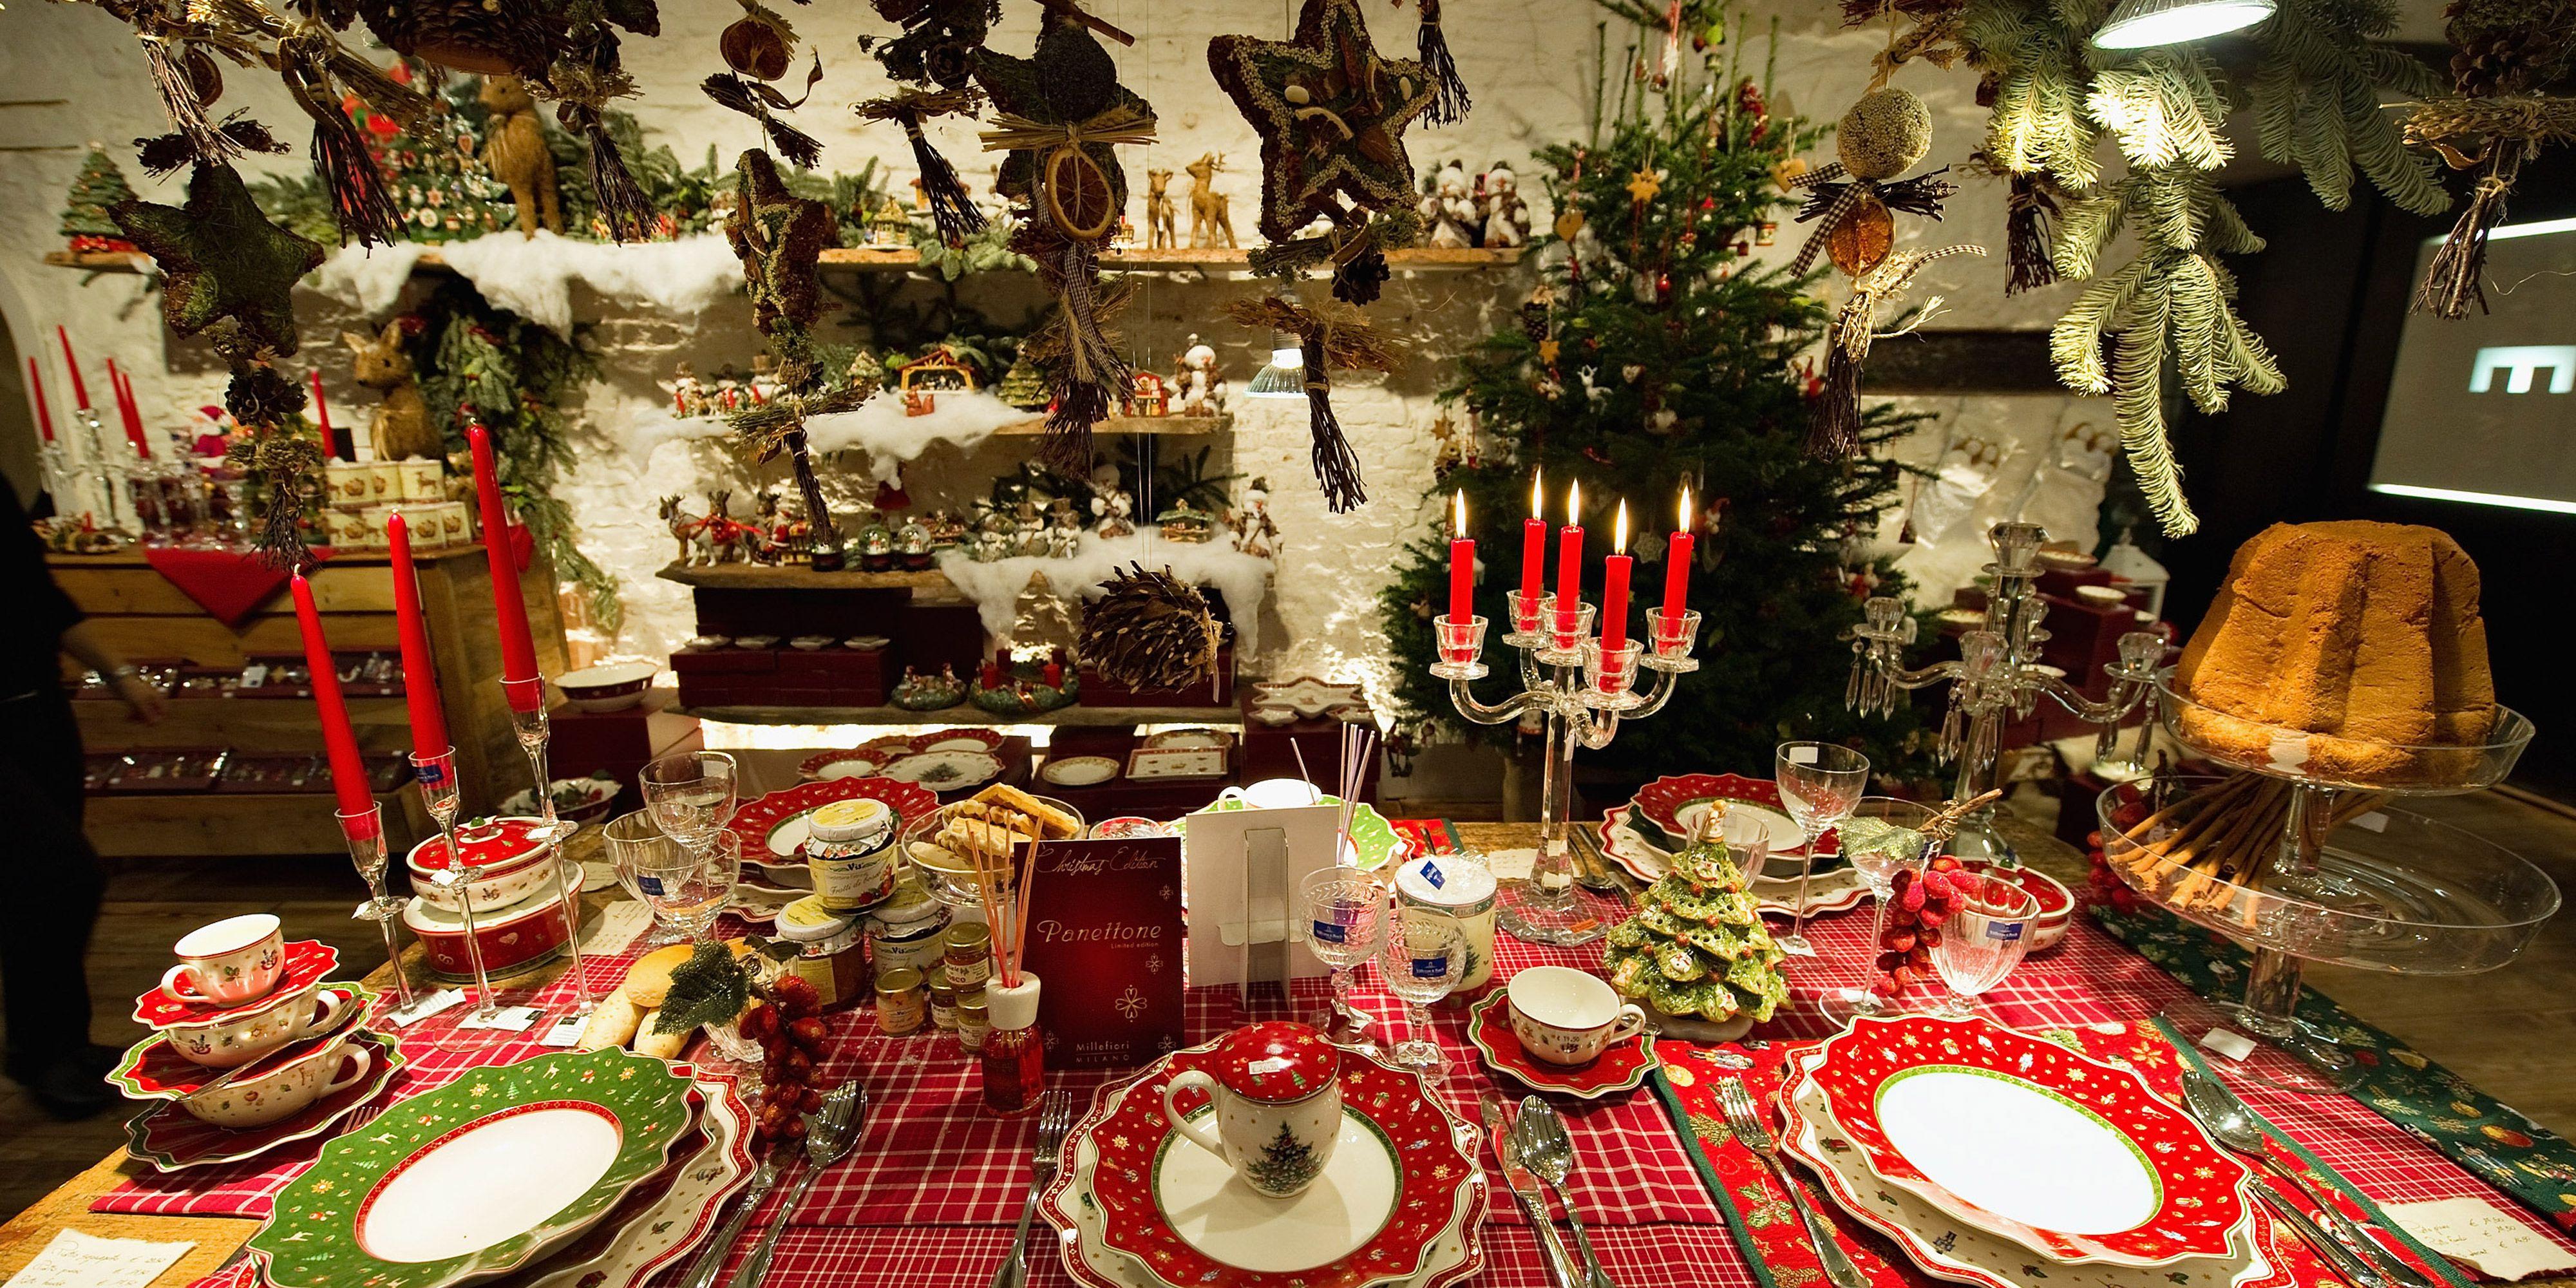 35 elegant christmas table settings stylish holiday table centerpieces